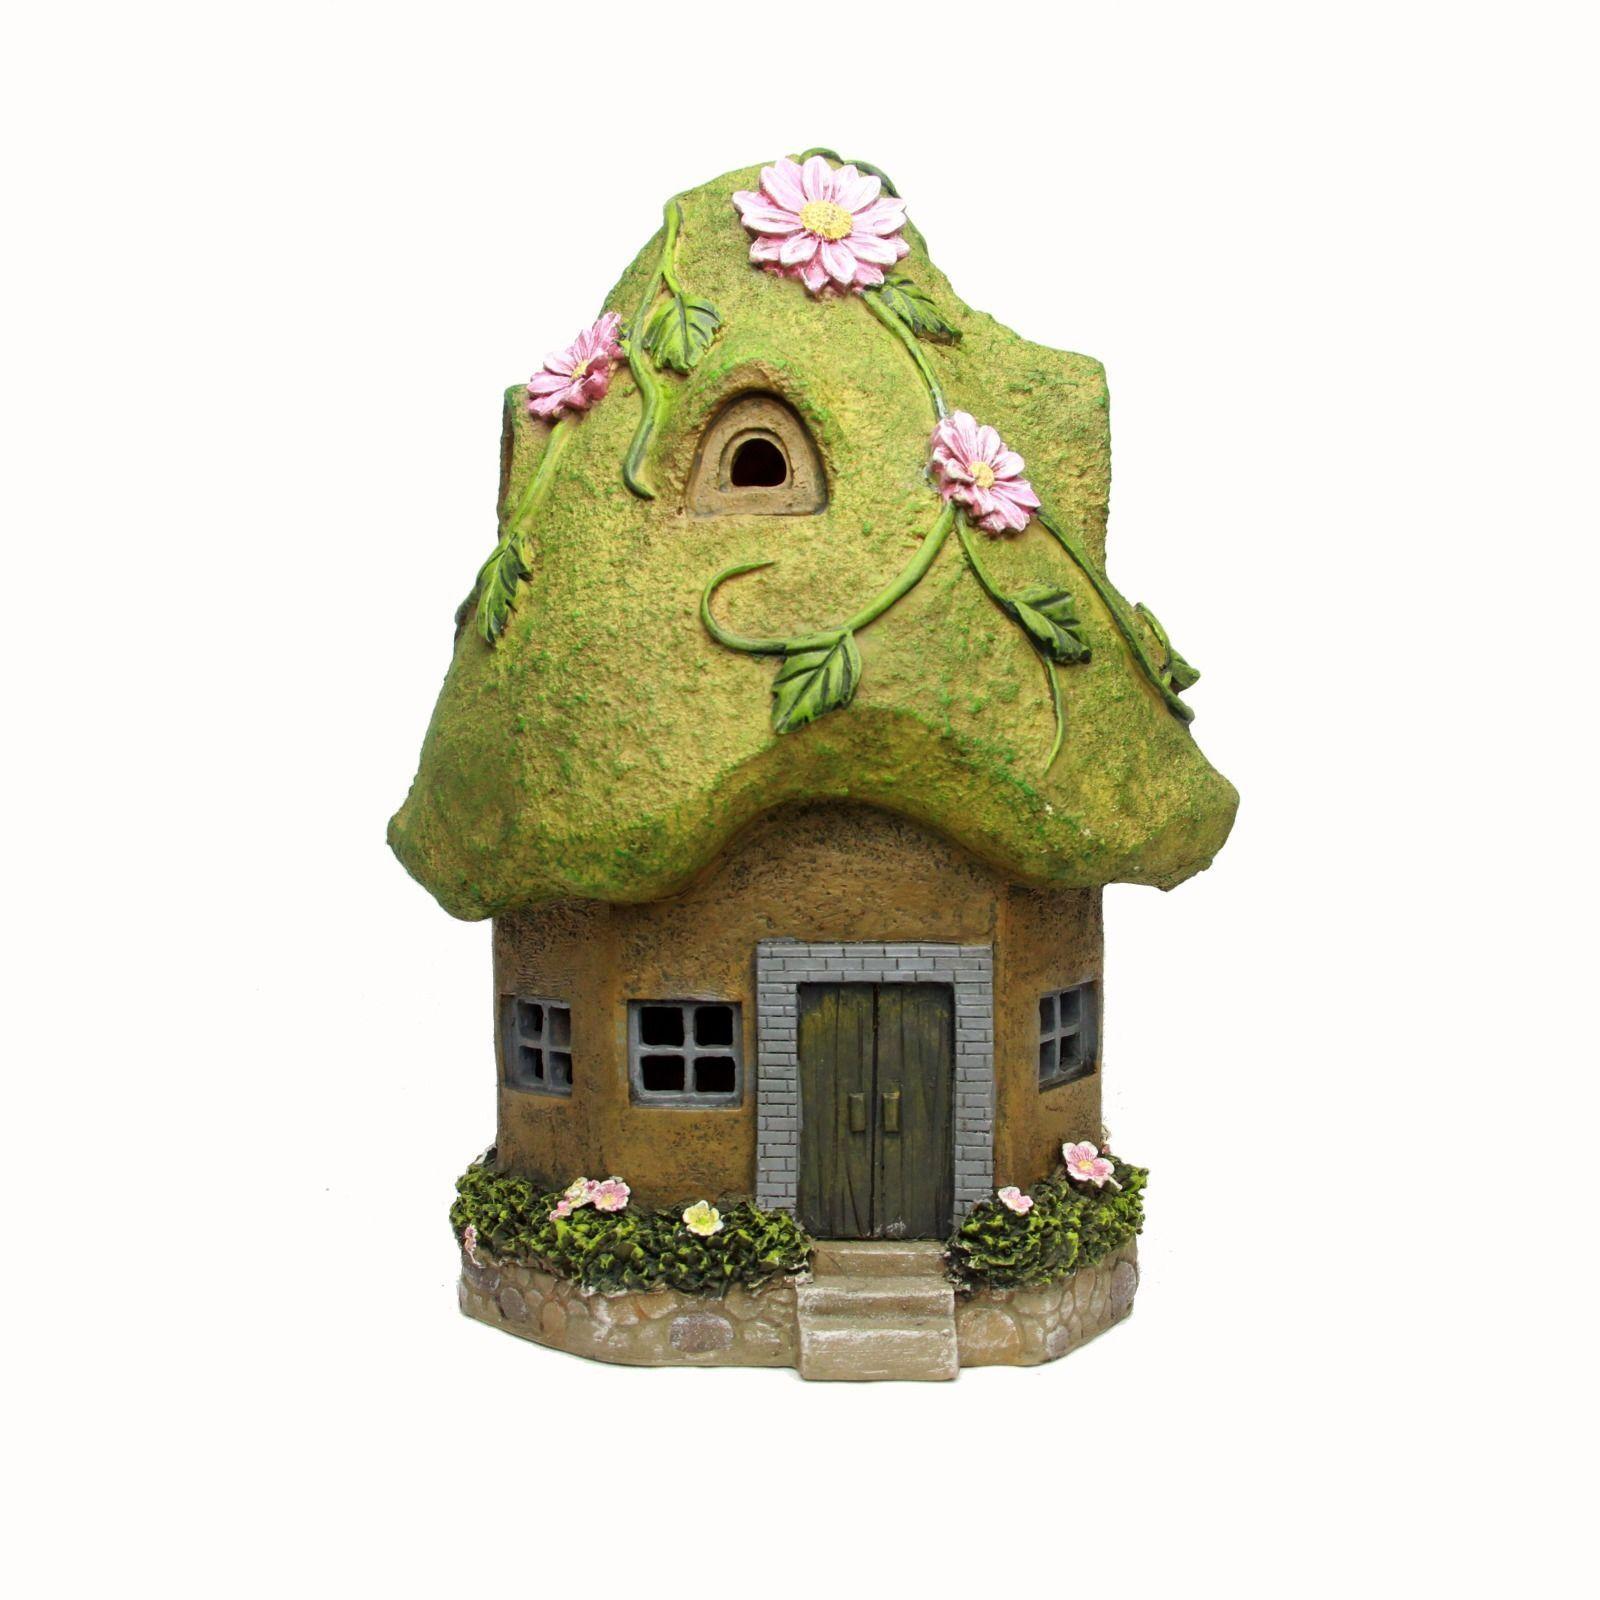 MOSS  SOLAR FAIRY HOUSE TWO STOREY HOUSE FAIRY  BNIB OUTDOOR 37cm/ 14.5 INCH 7899ab